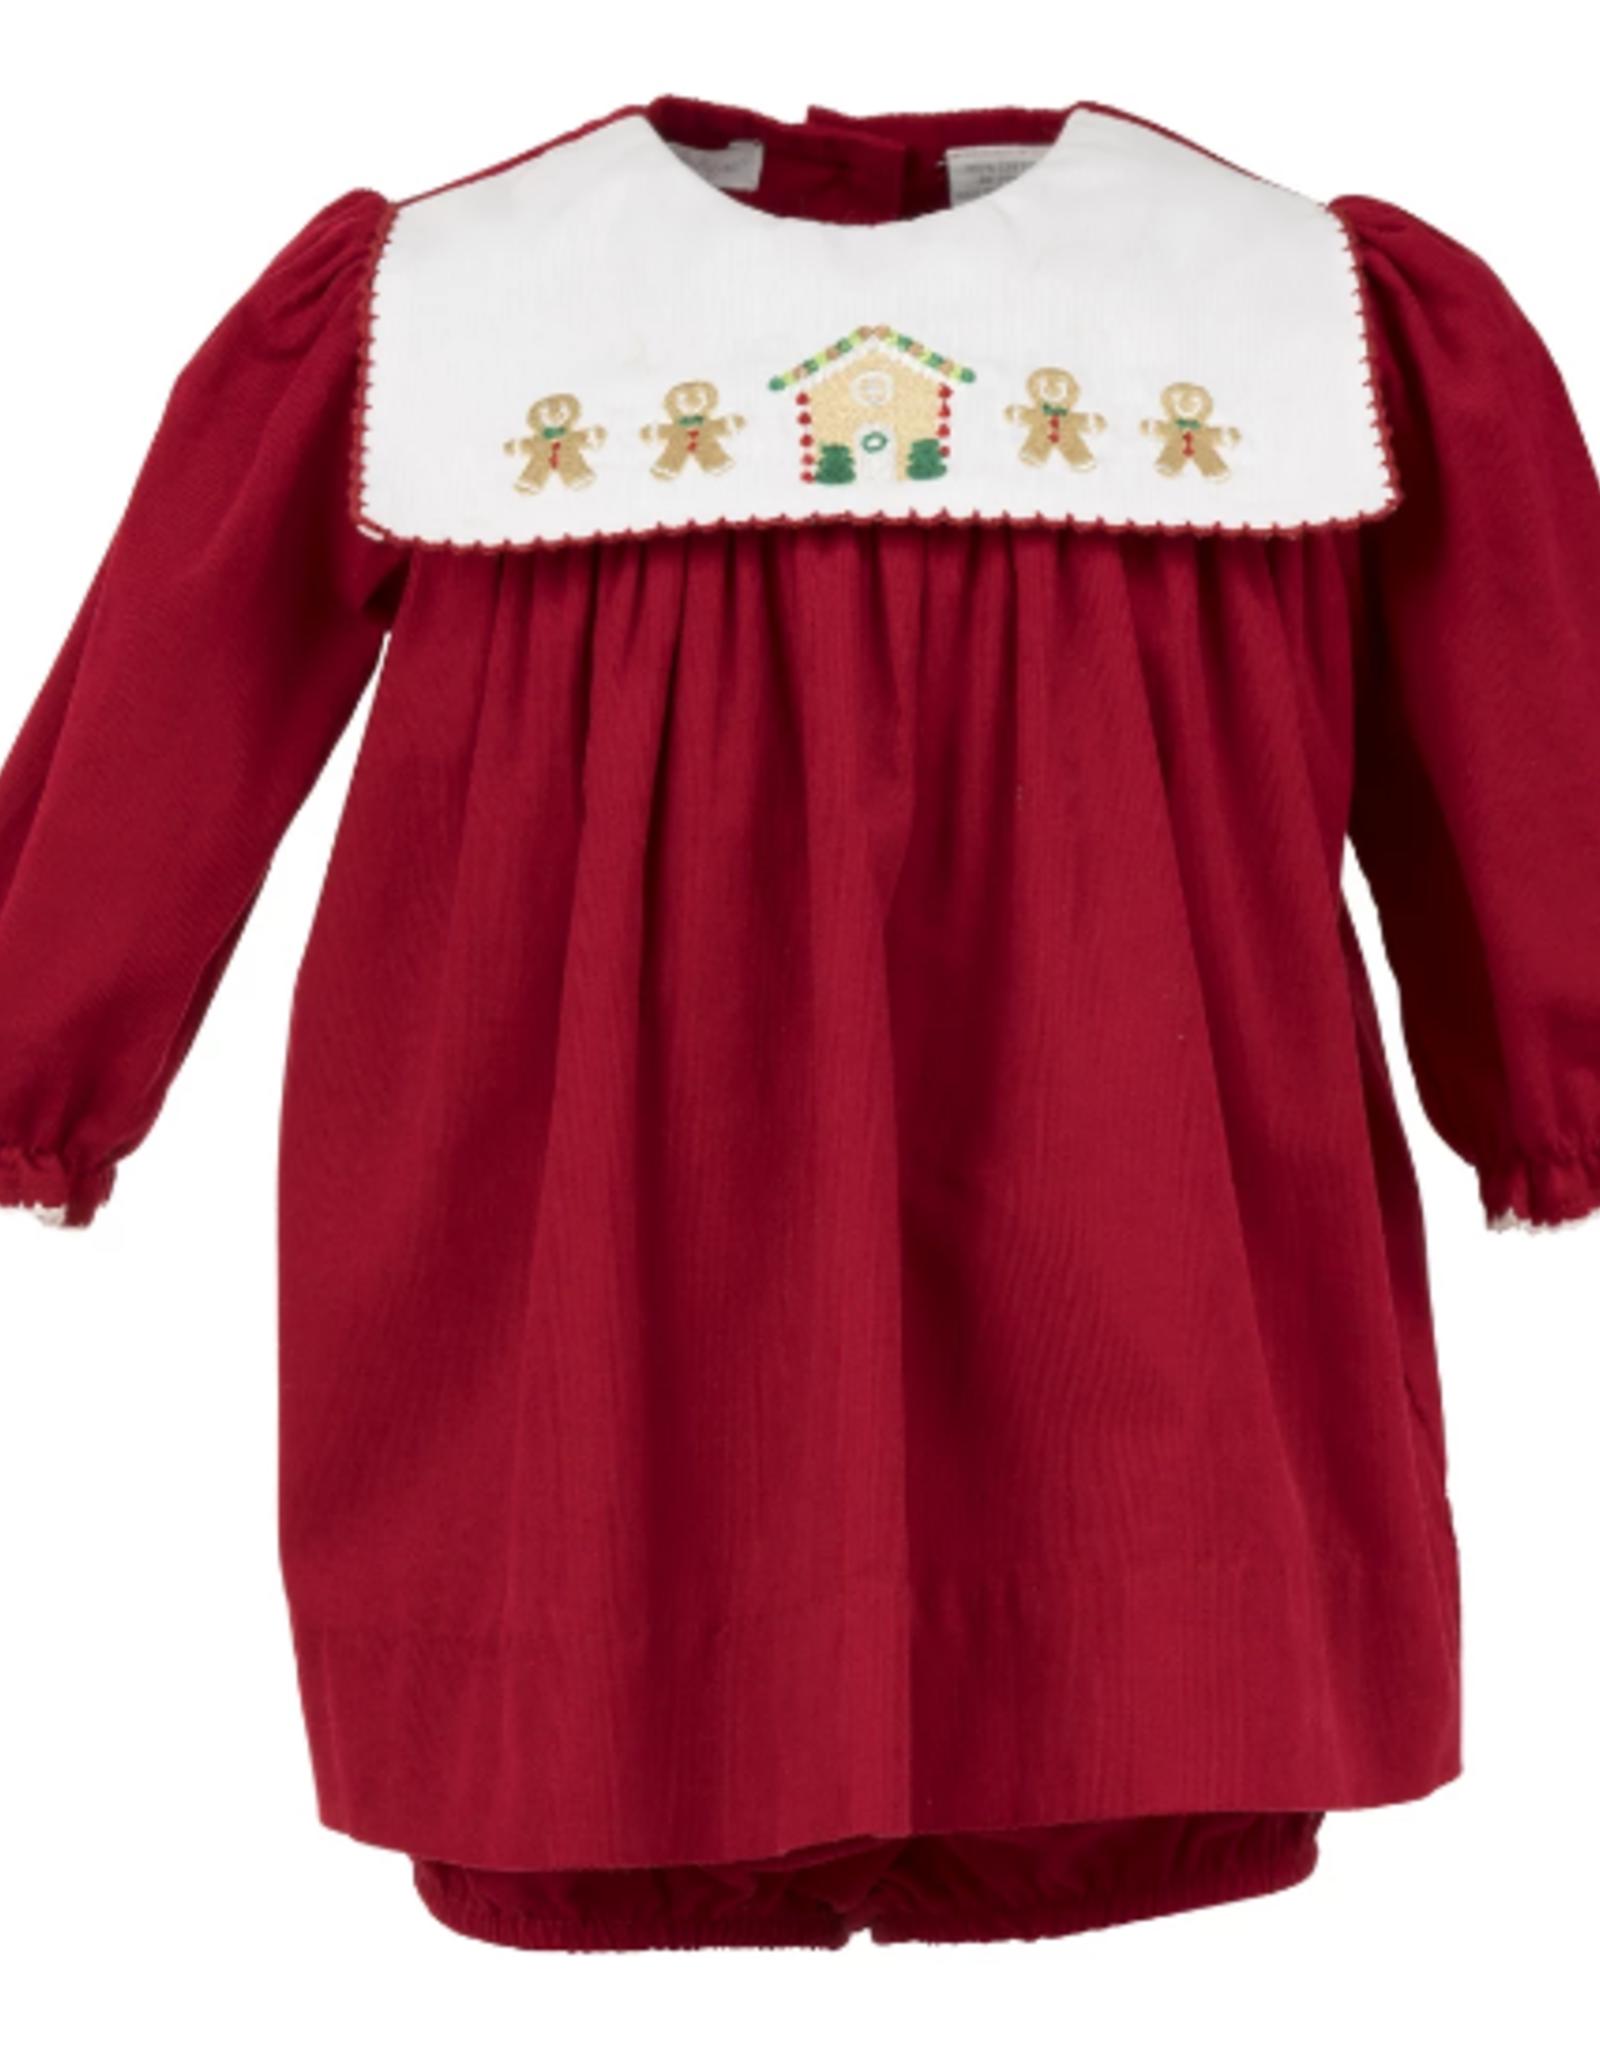 Carriage Boutique Gngrbrd Dress/Bnnt